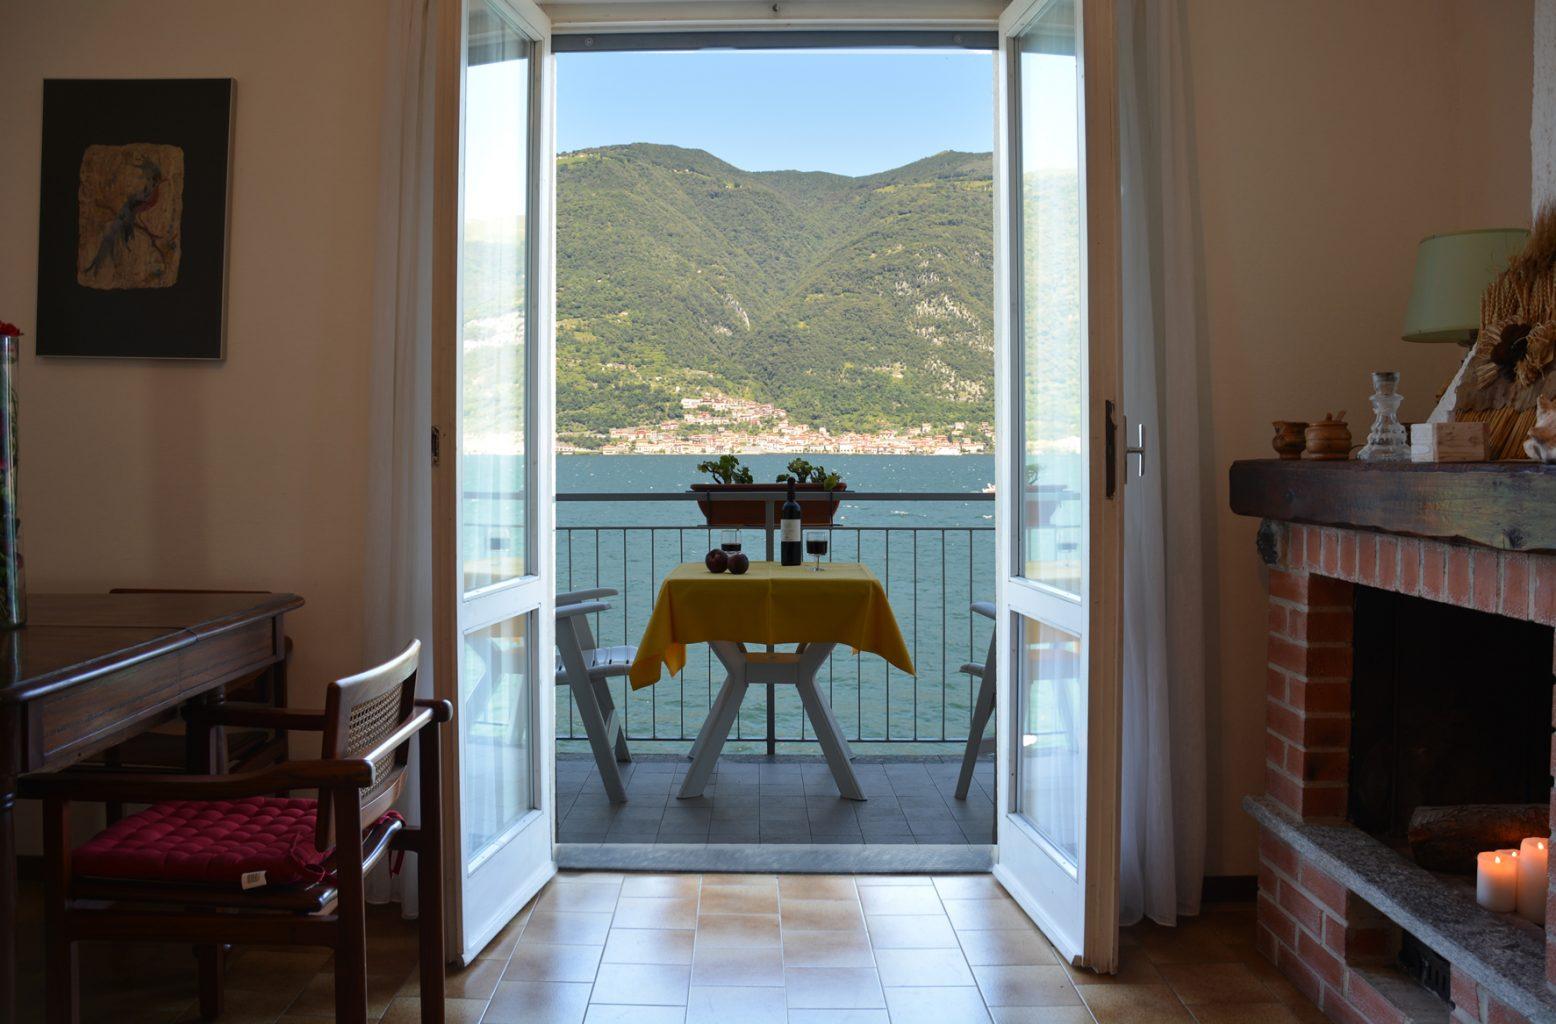 la-traviata-apartment-bellagio-balcony-and-livingroom-on-the-lake.jpg